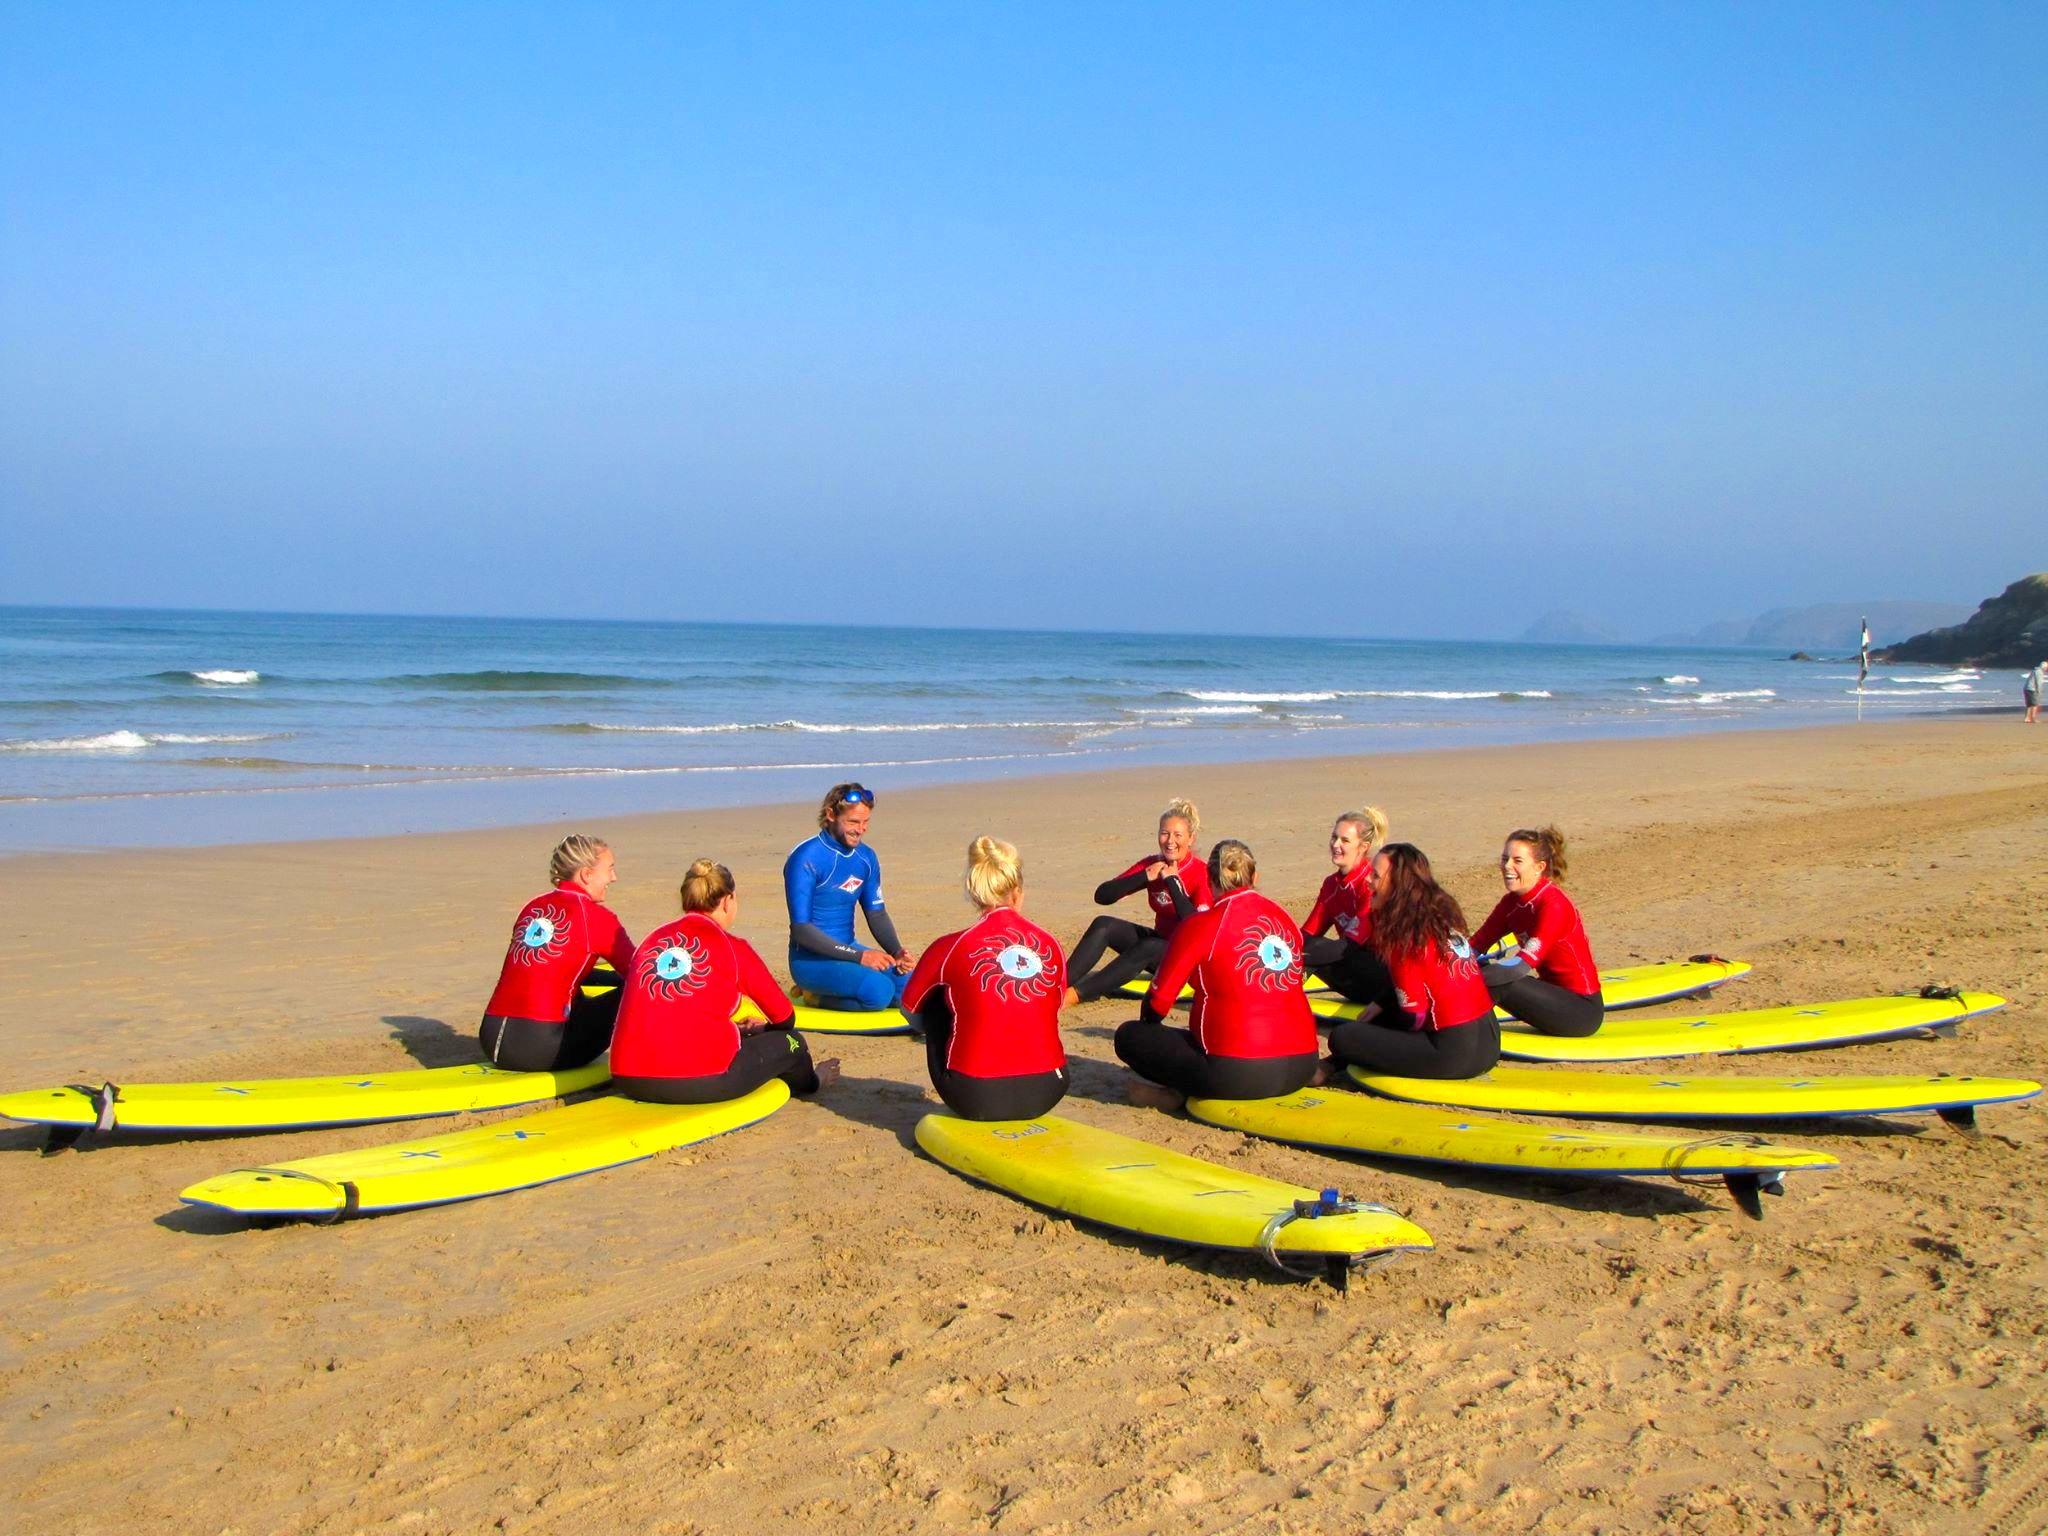 ride-on-retreats-beach-surf-lesson.jpg